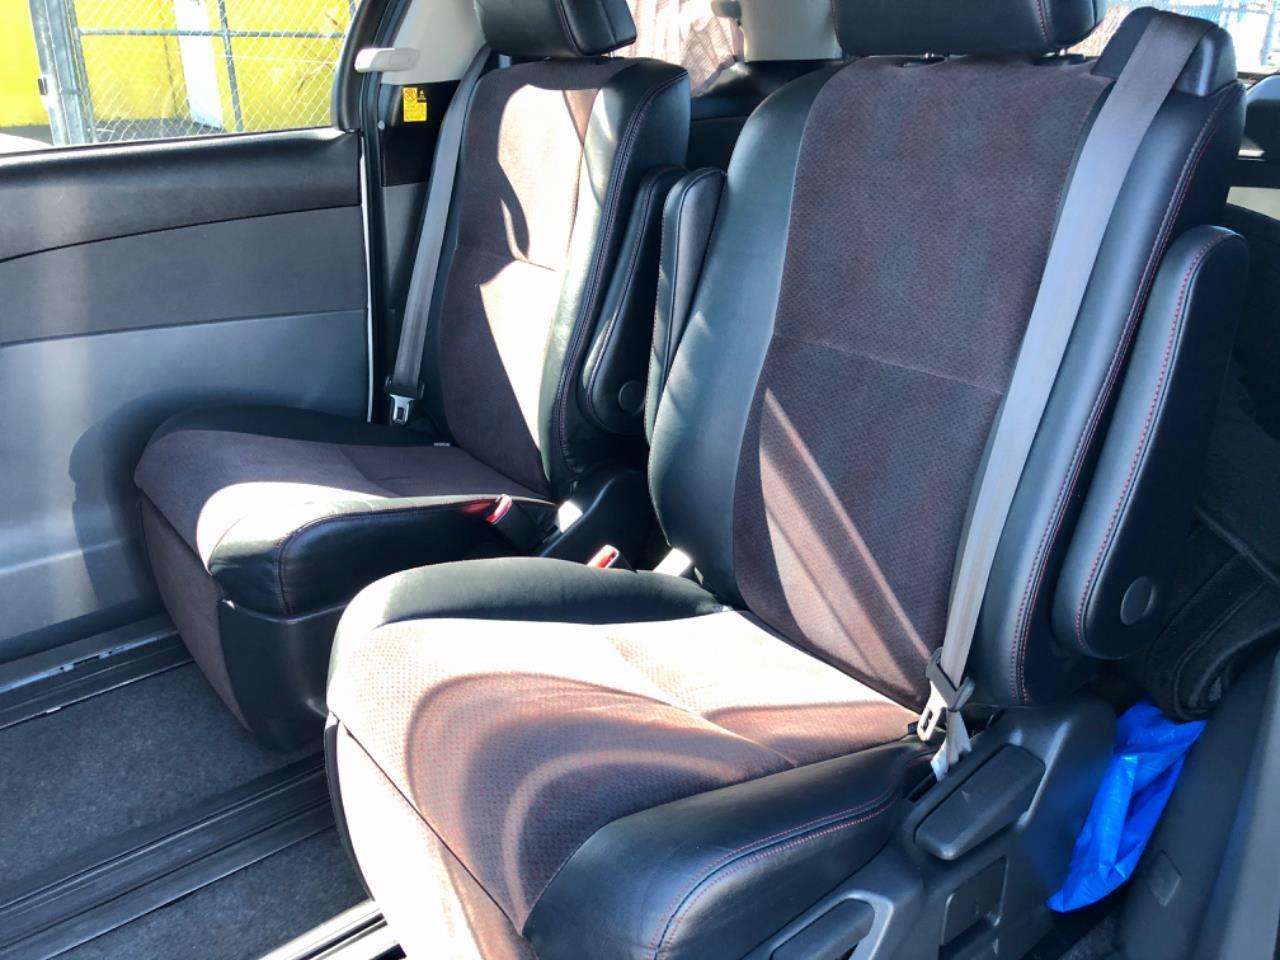 image-16, 2011 Toyota Estima Aeras 20th Anniversary Edition at Christchurch